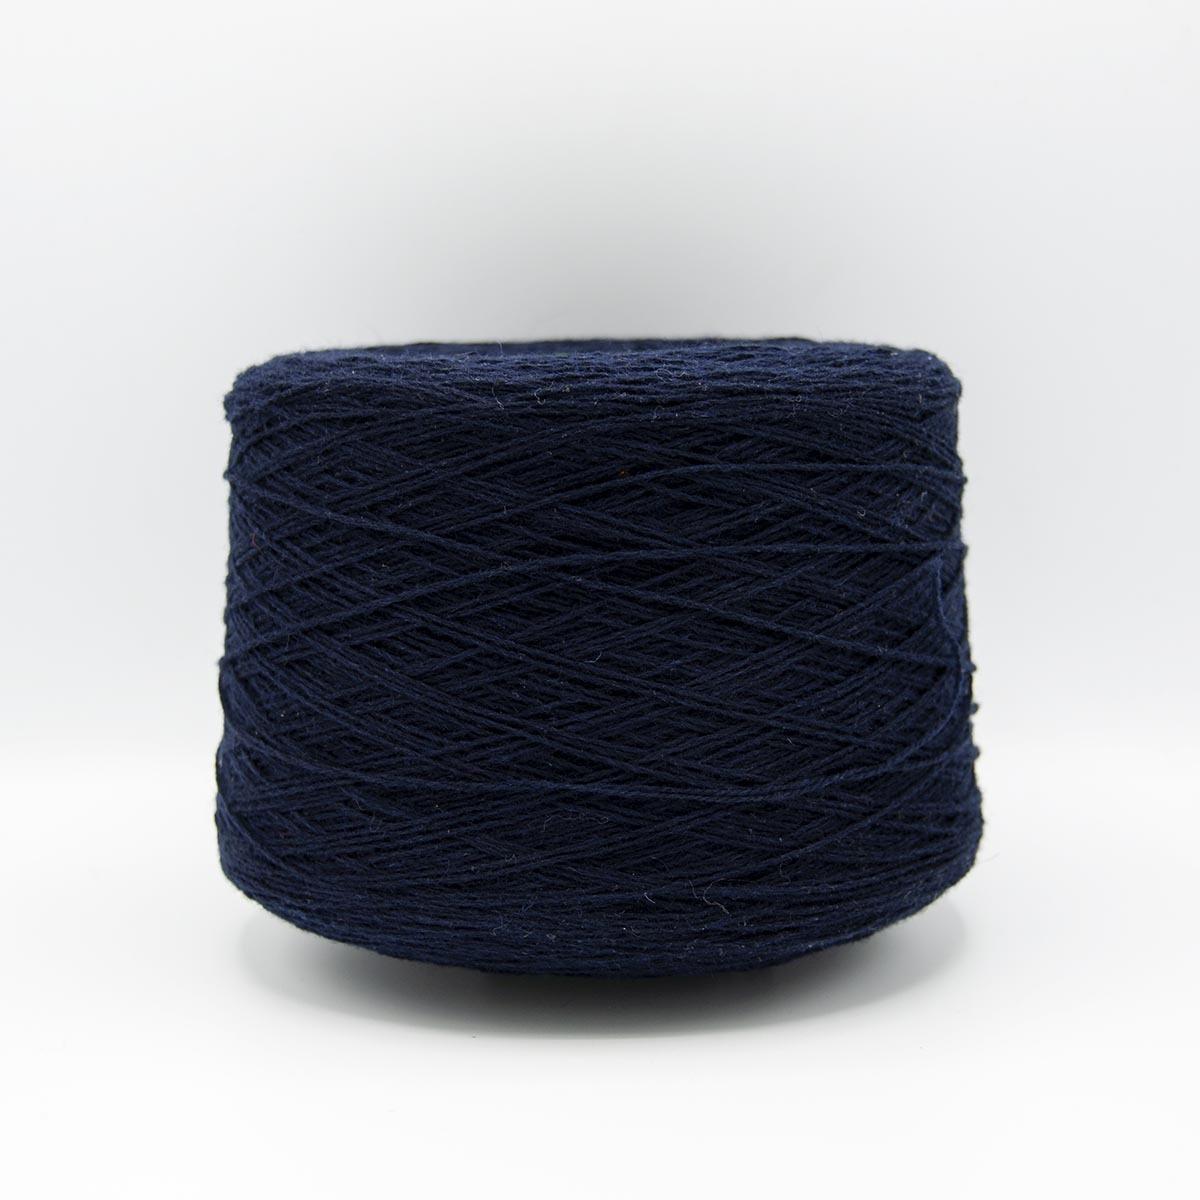 Knoll Yarns Merino Lambswool - 131